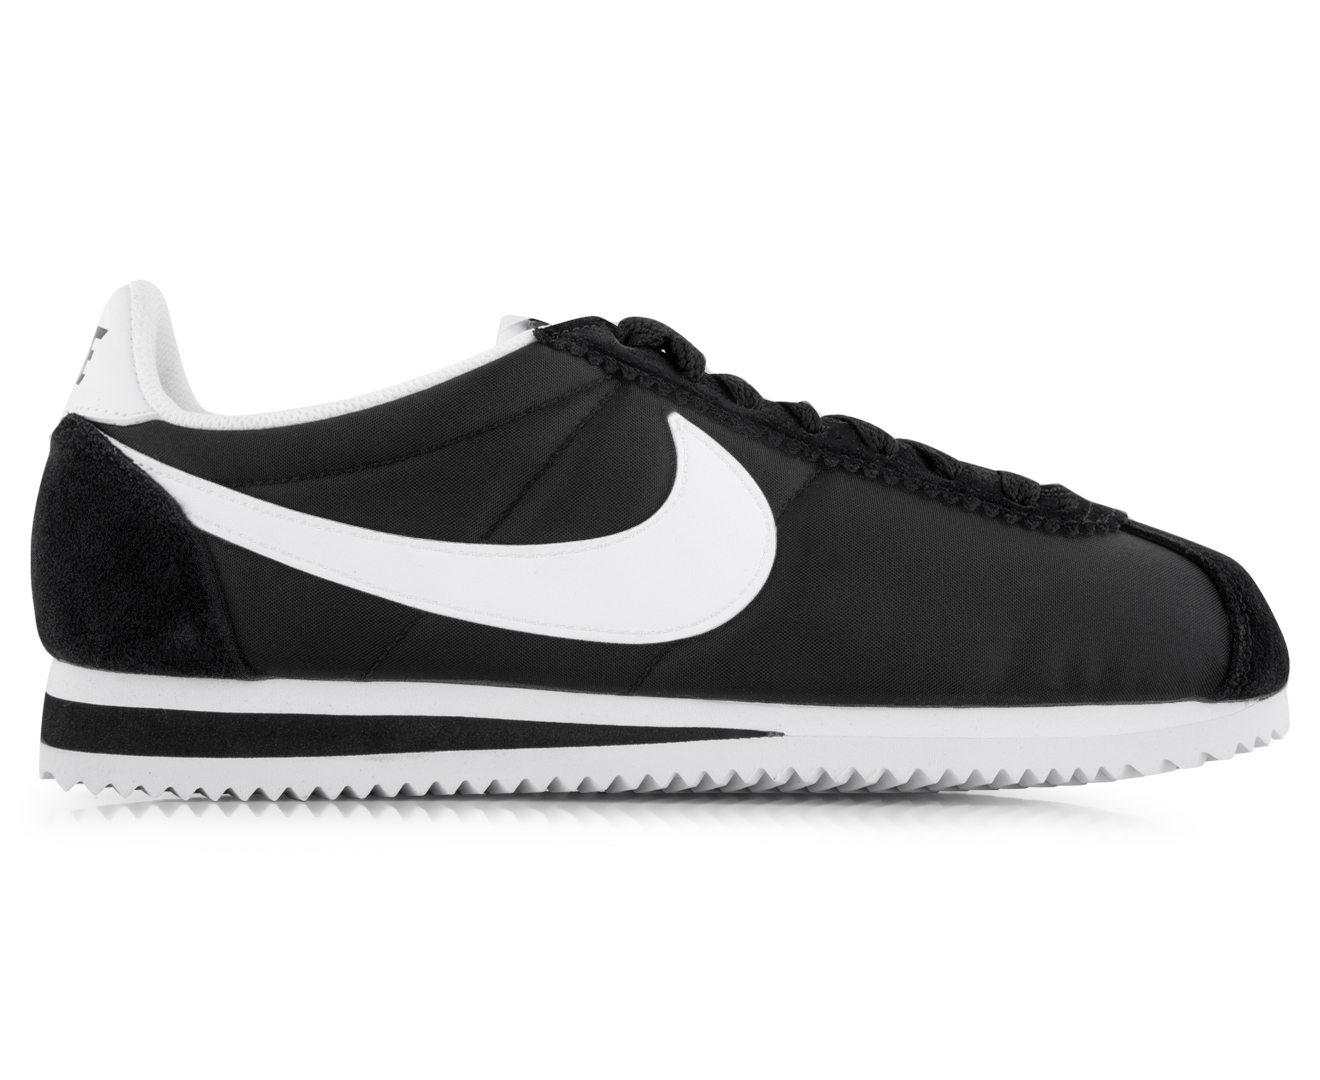 super popular daf9e c8e4f Image is loading Nike-Women-039-s-Classic-Cortez-Nylon-Shoe-